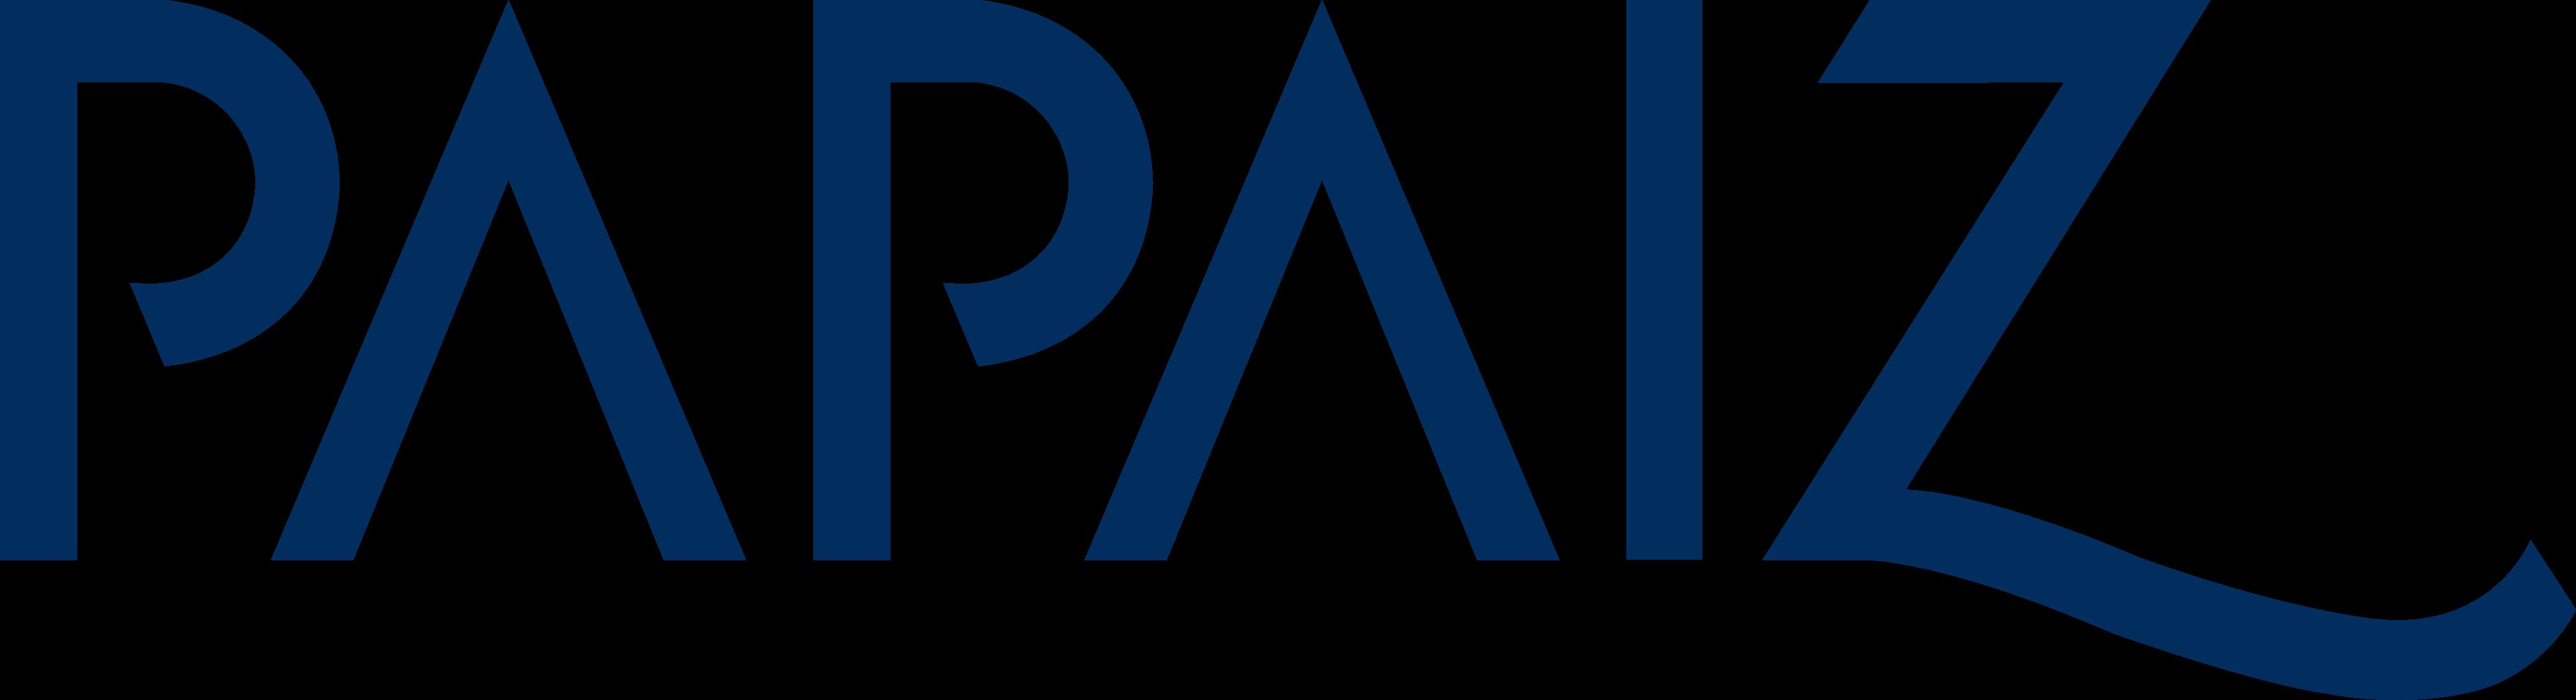 papaiz logo - Papaiz Logo